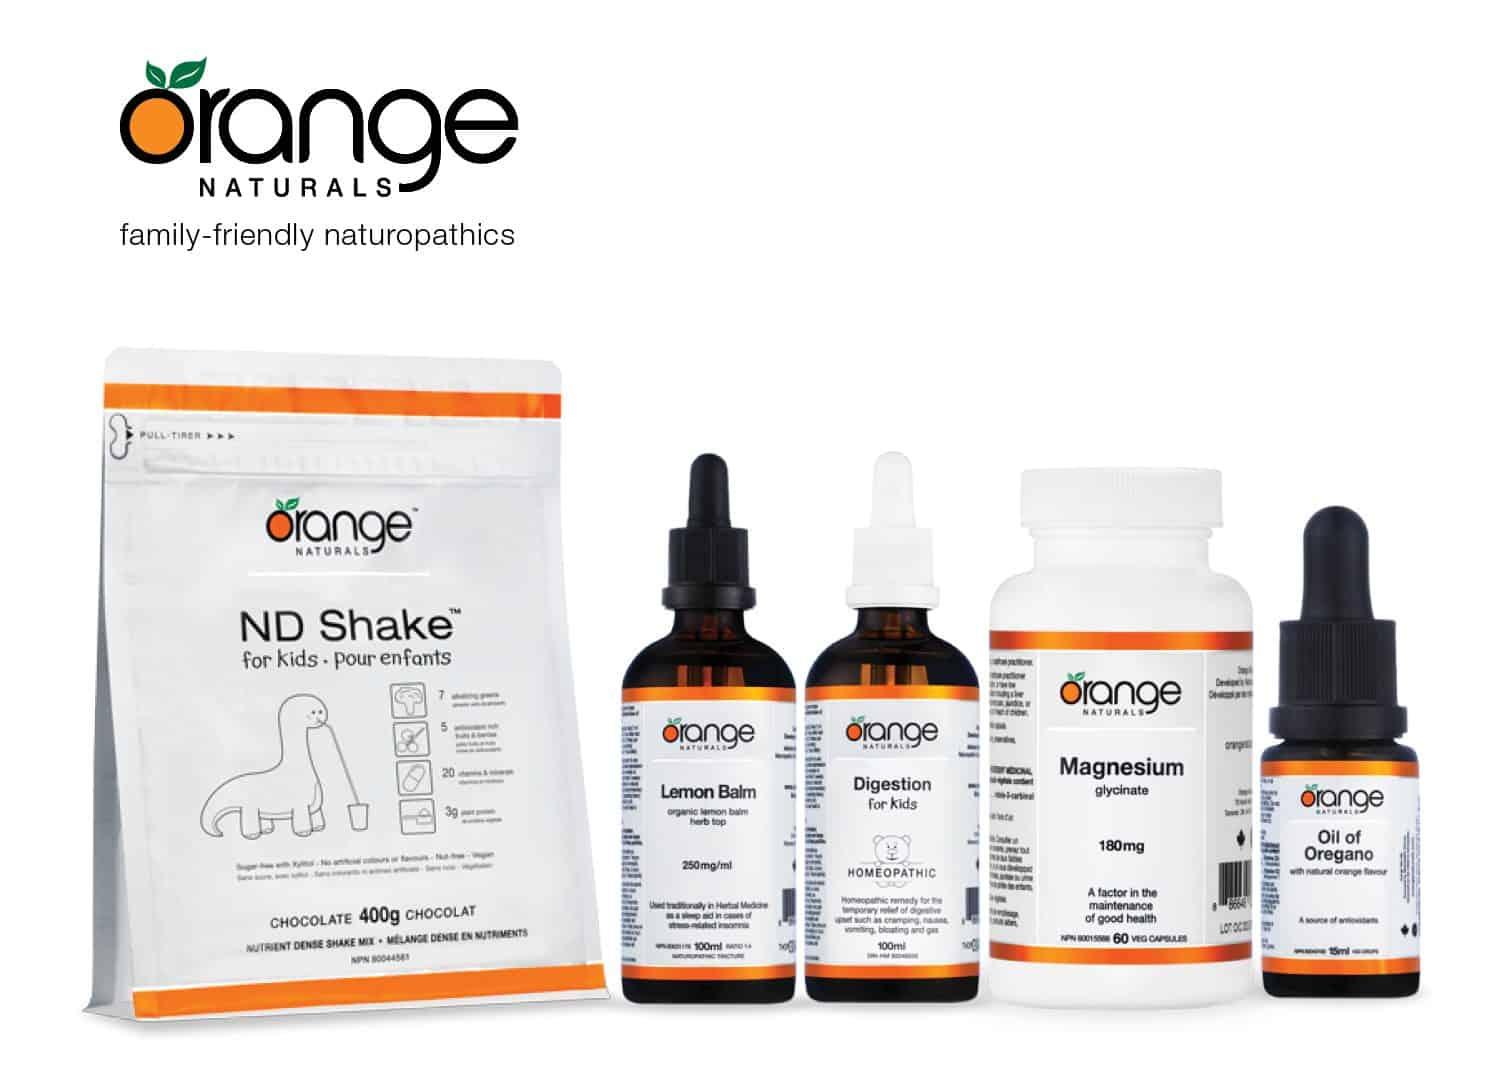 orange naturals coupon